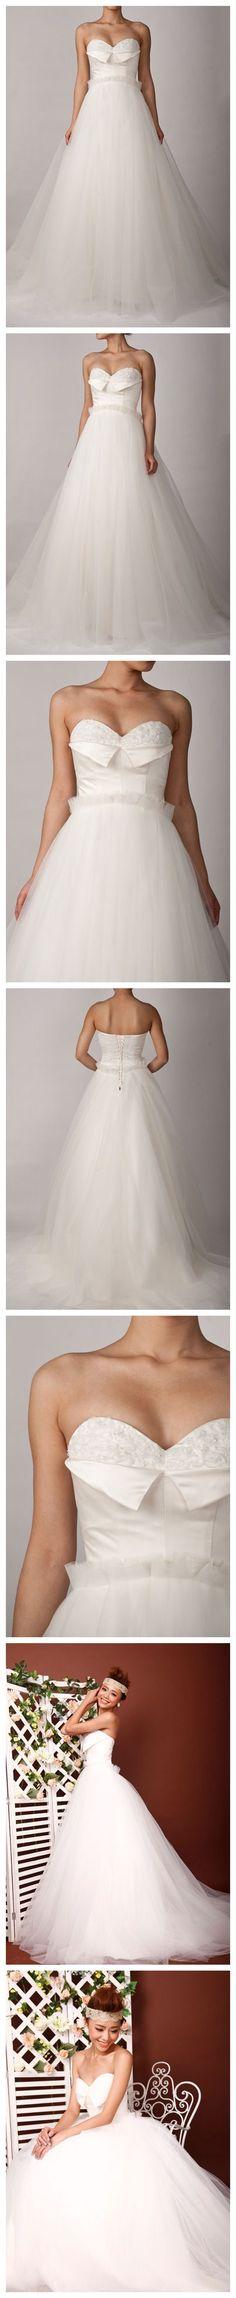 Sweetheart Lapel Neckline Ruffle Waist Wedding Dress